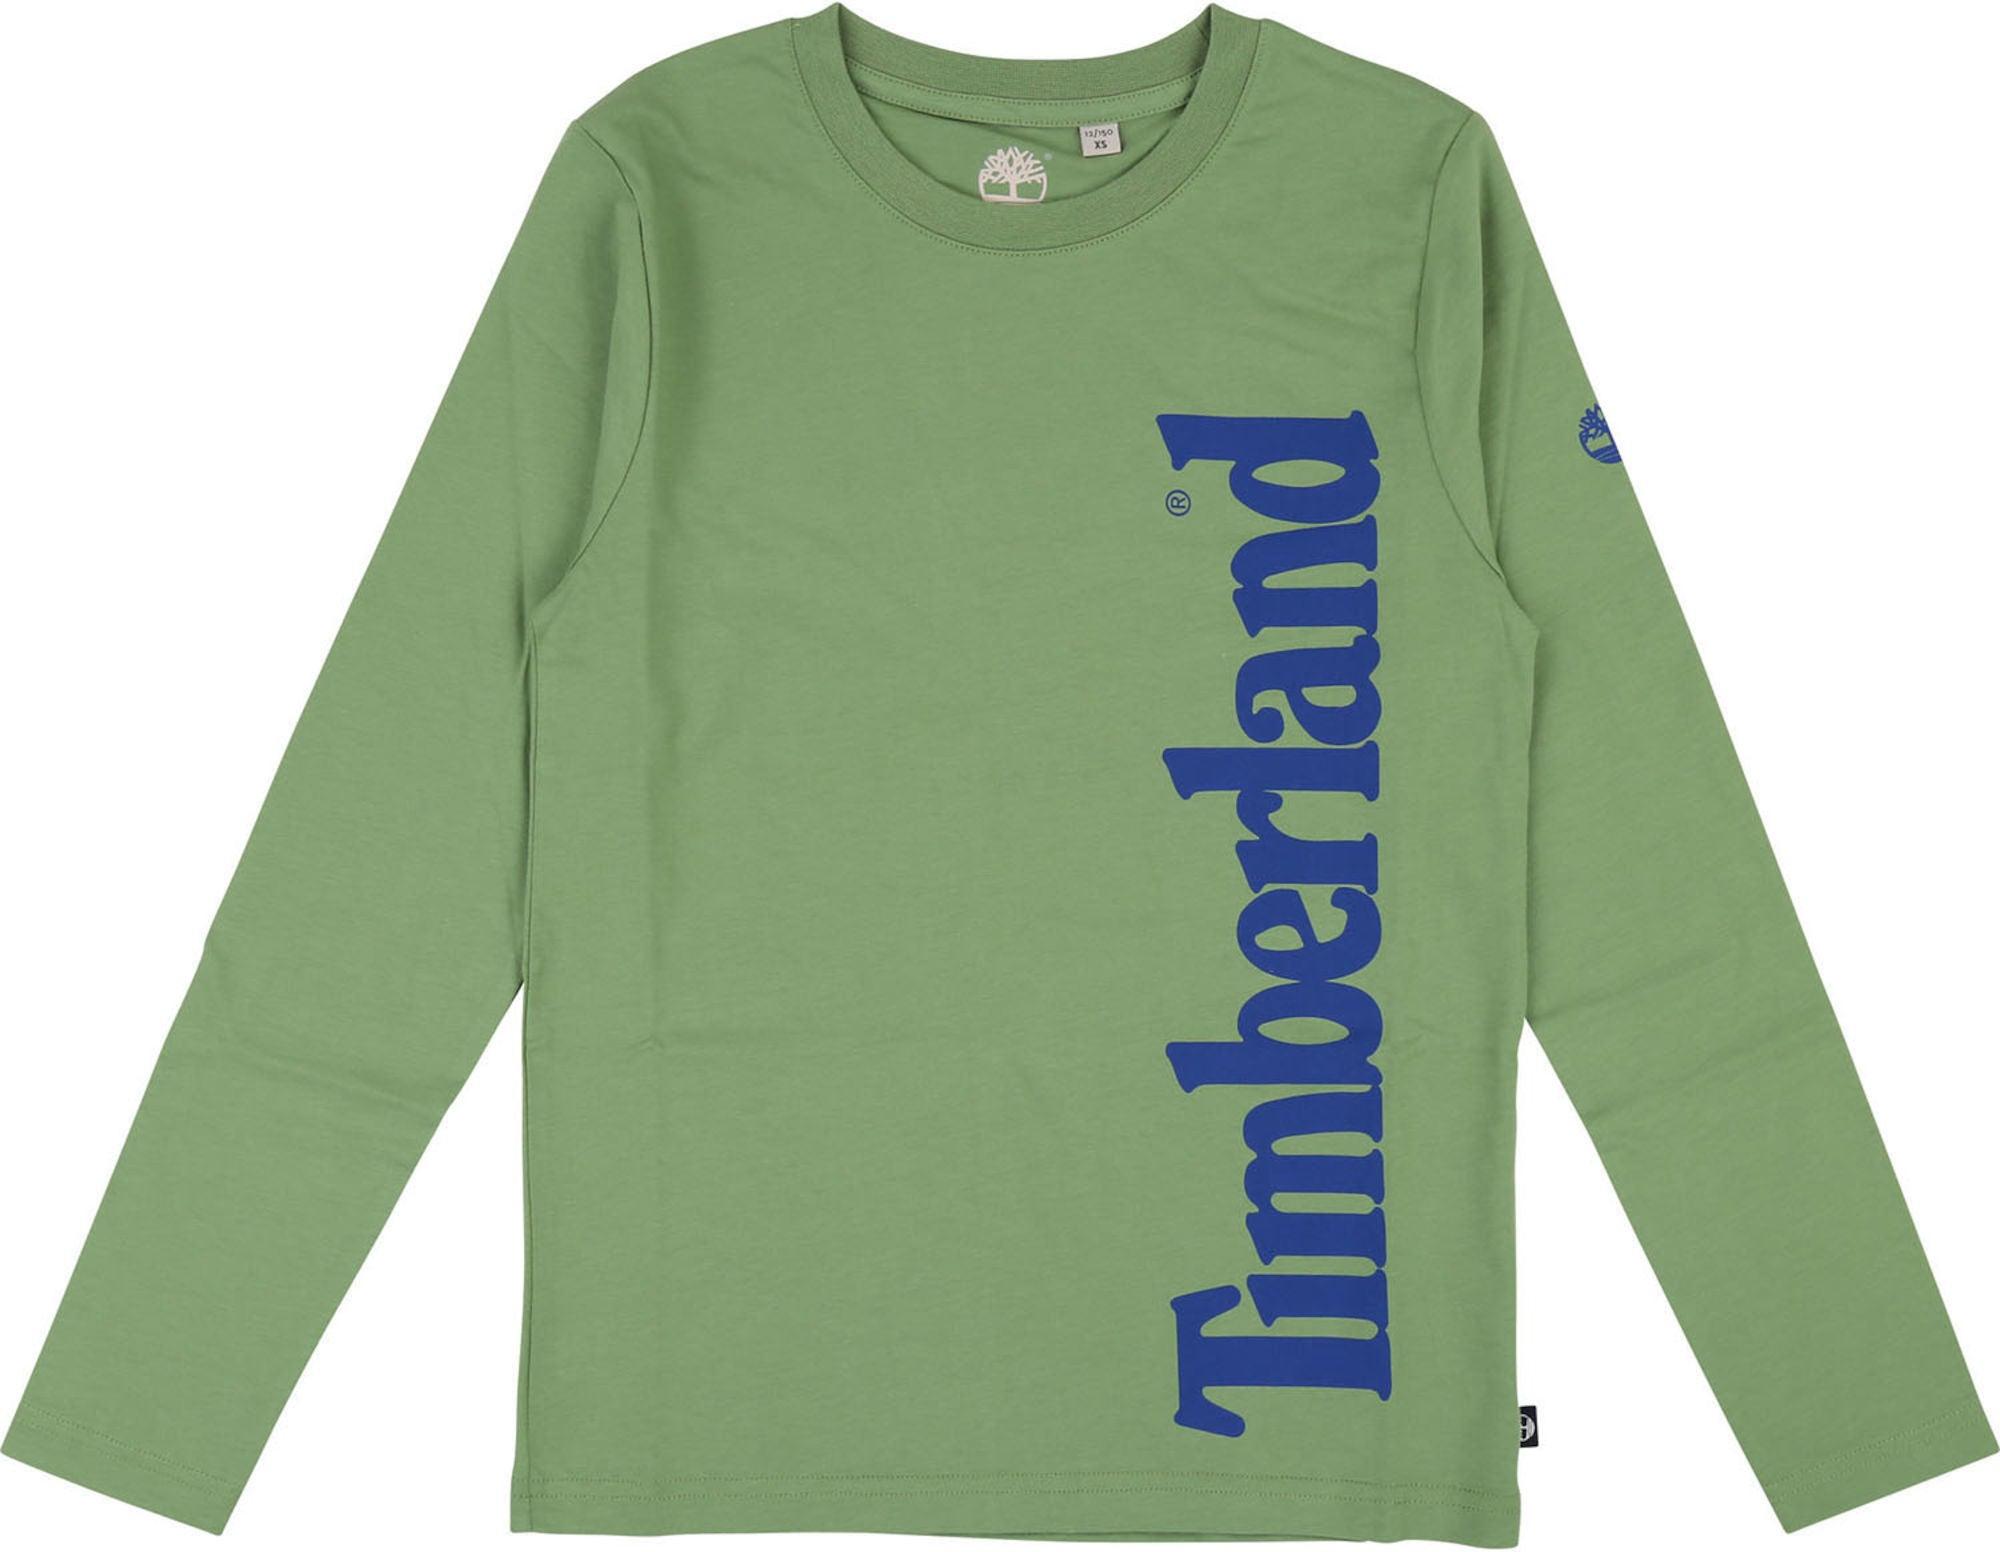 81e230837ac Köp Timberland Långärmad T-Shirt, Green   Jollyroom